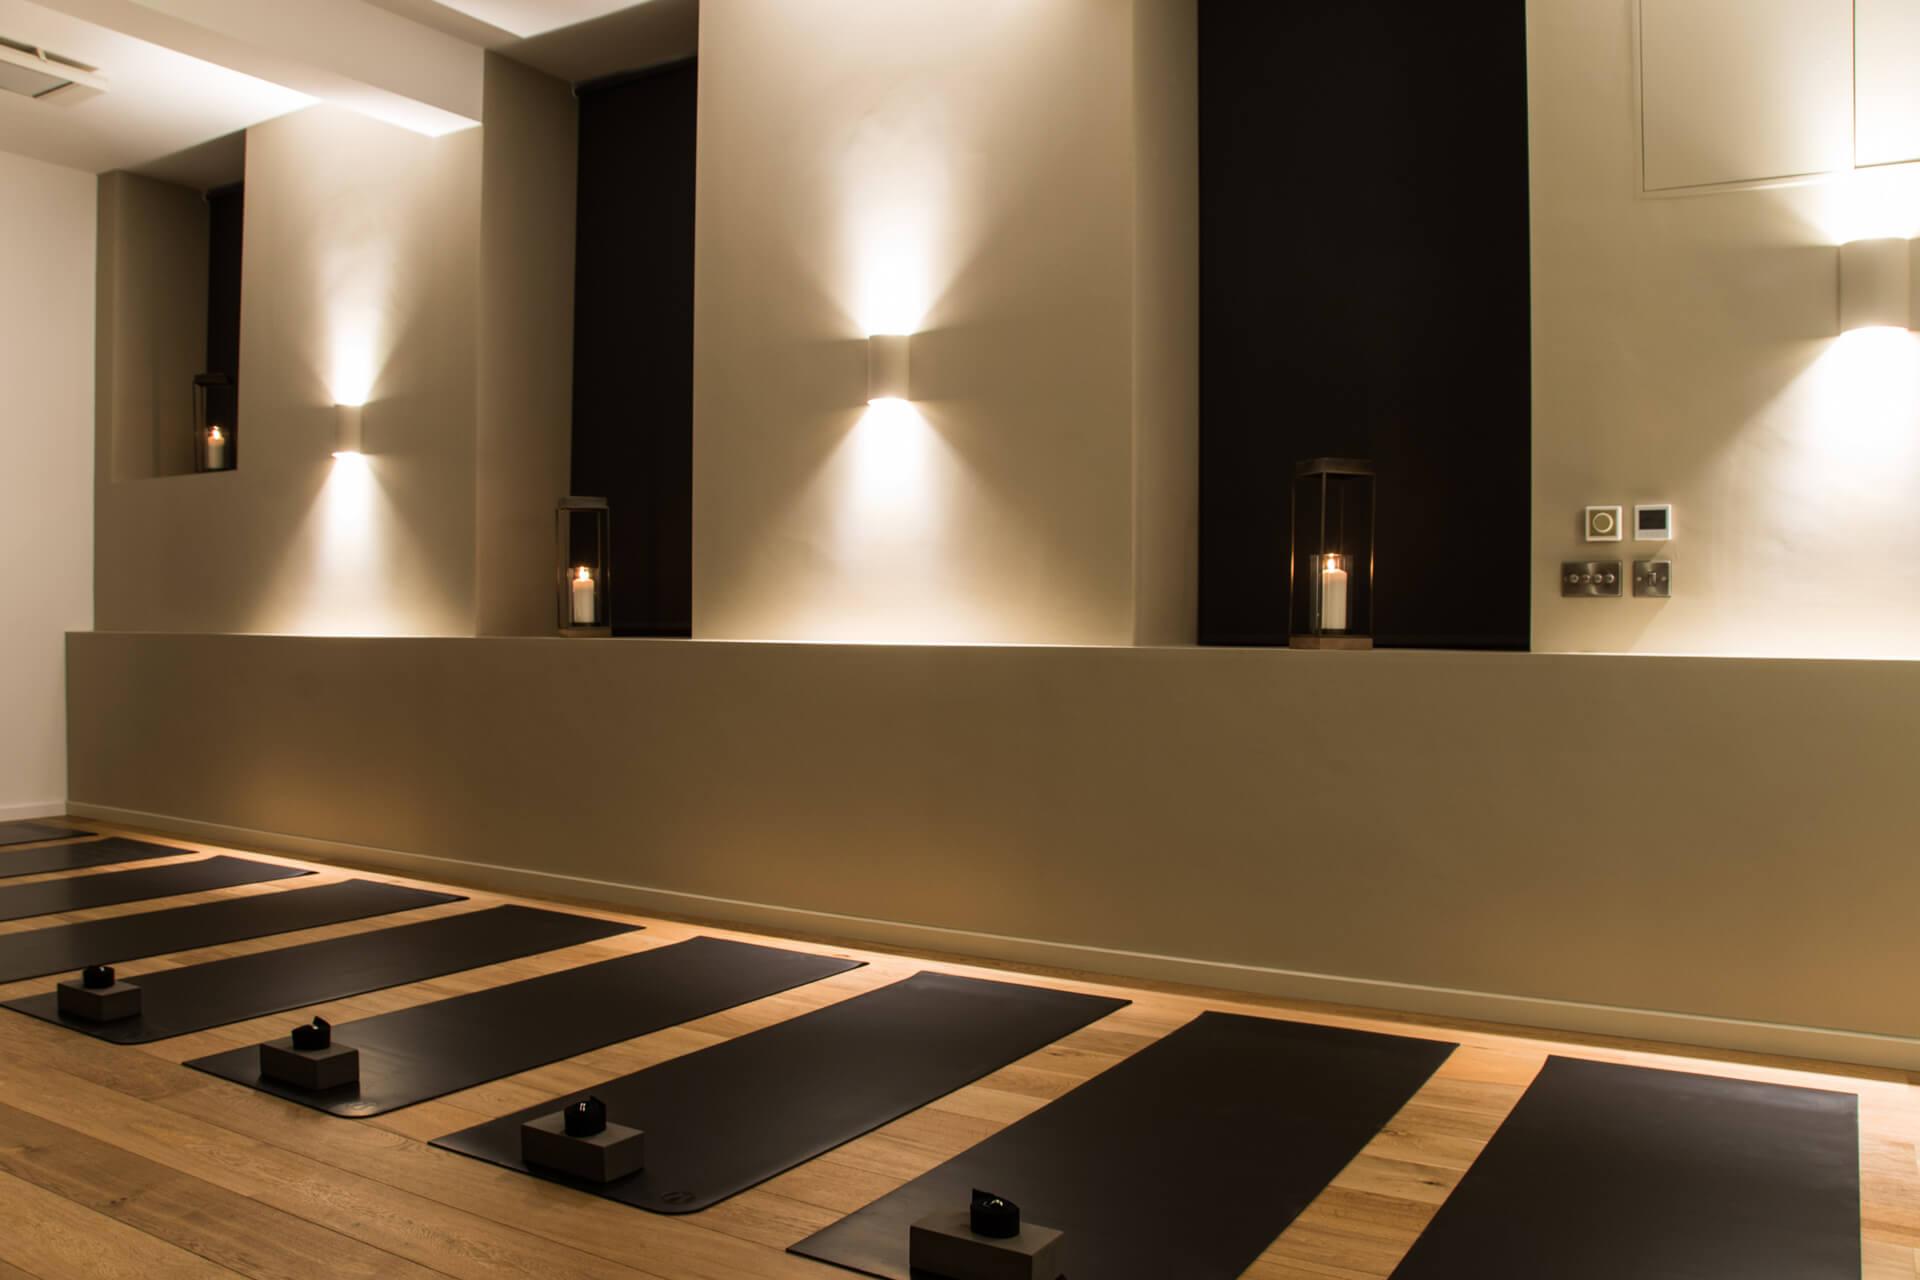 Be Yoga Space mats in studio